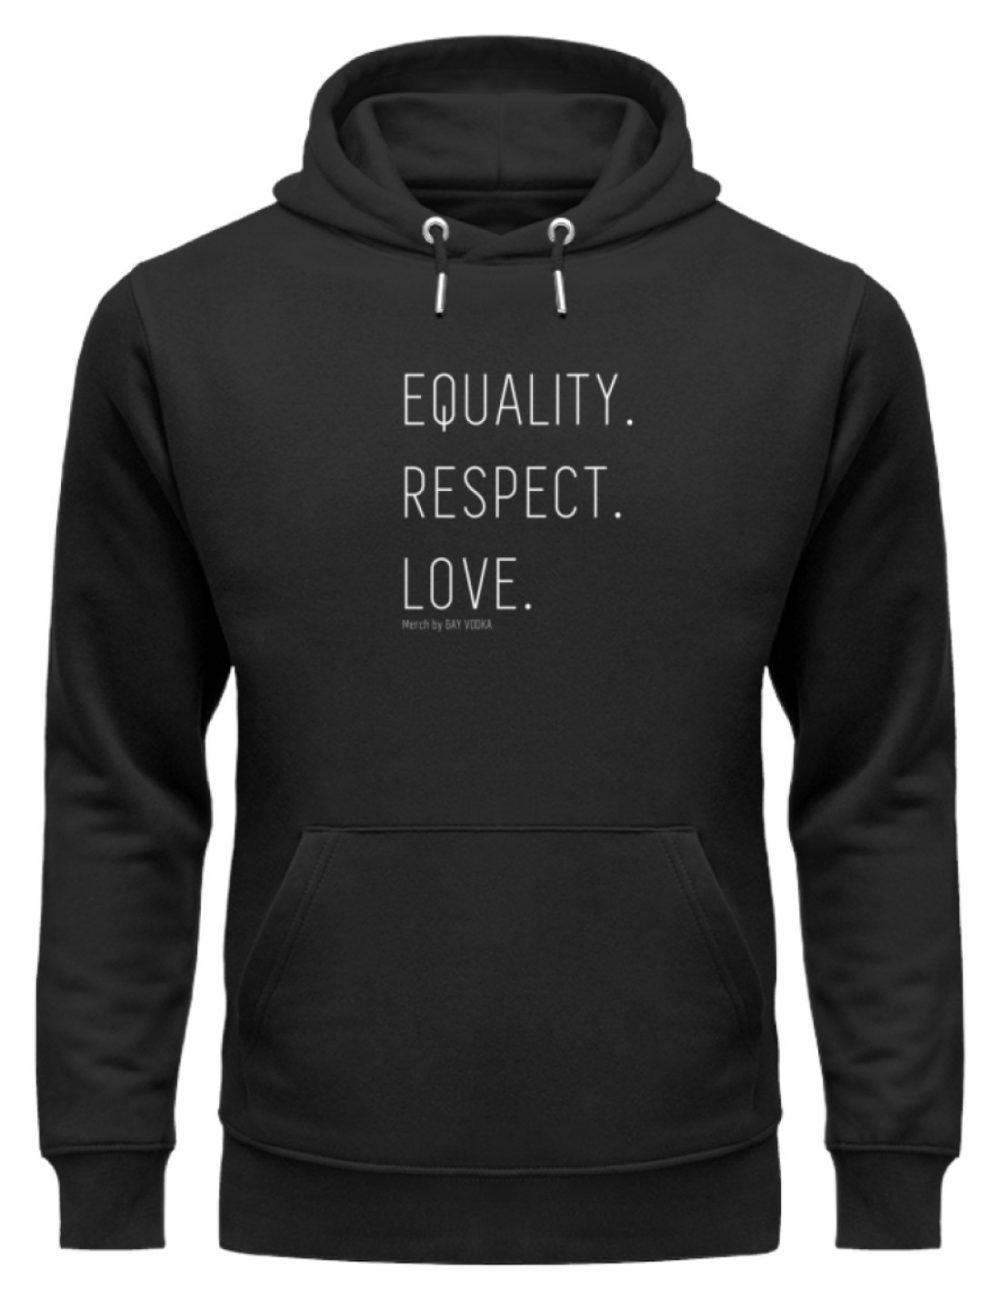 EQUALITY. RESPECT. LOVE. - Unisex Organic Hoodie-16